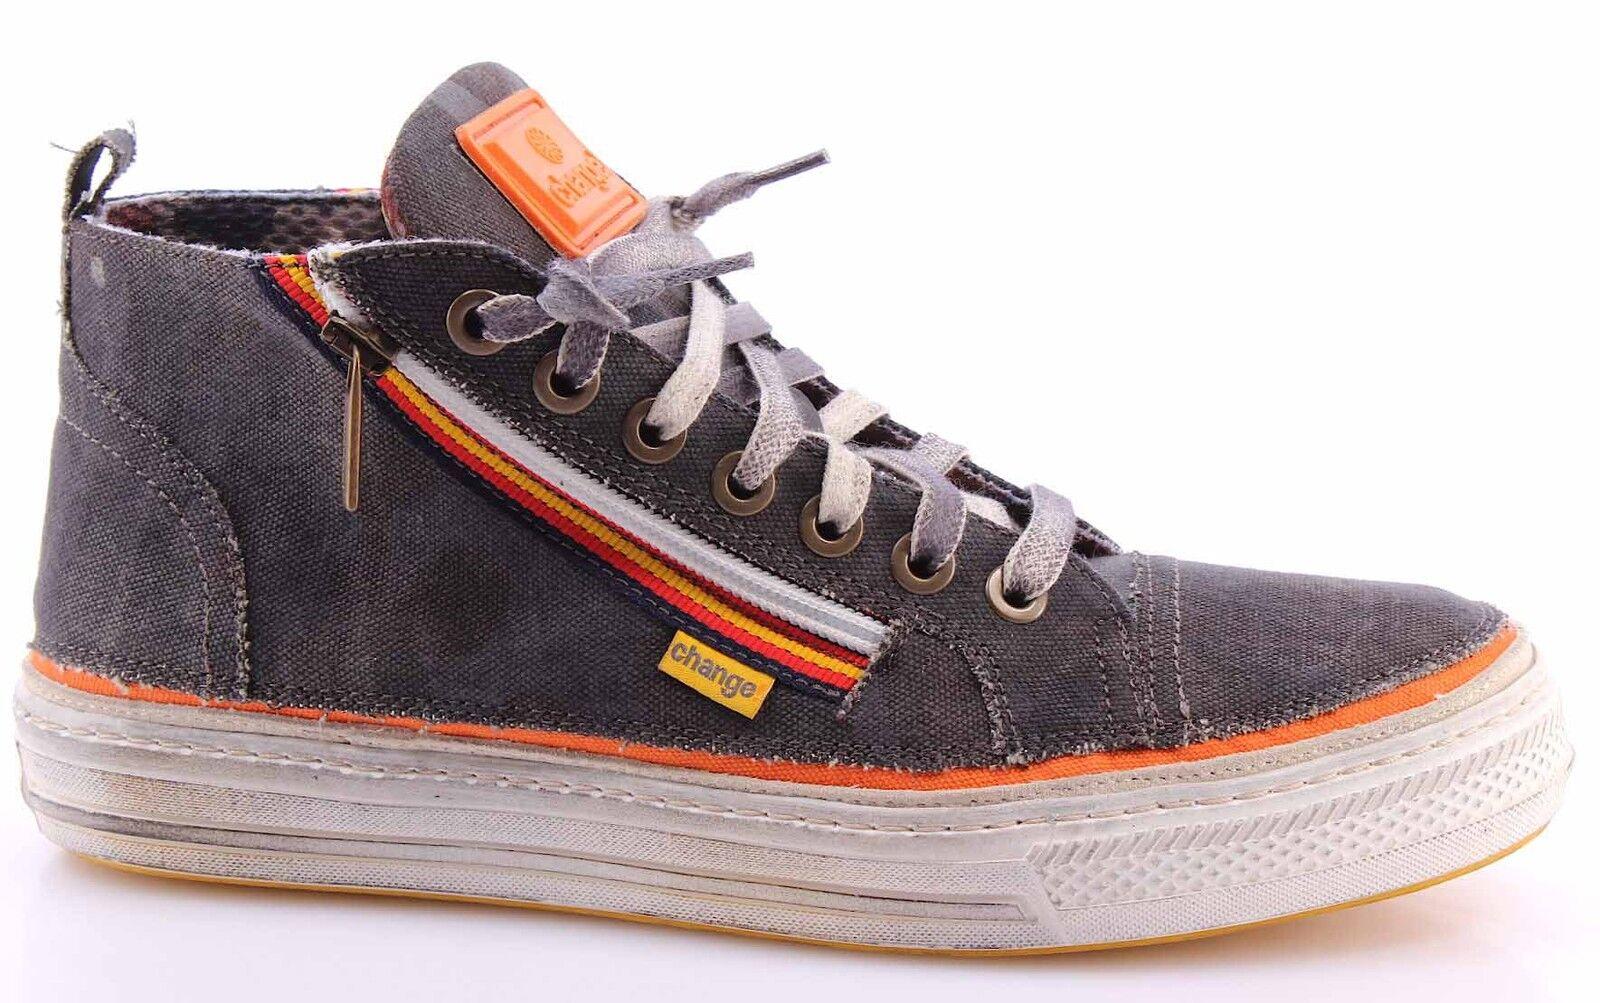 Scarpe Sneakers Alte Uomo CHANGE! DoorsM In Canvas3 Tessuto Arancio Made In DoorsM Italy 5b6480